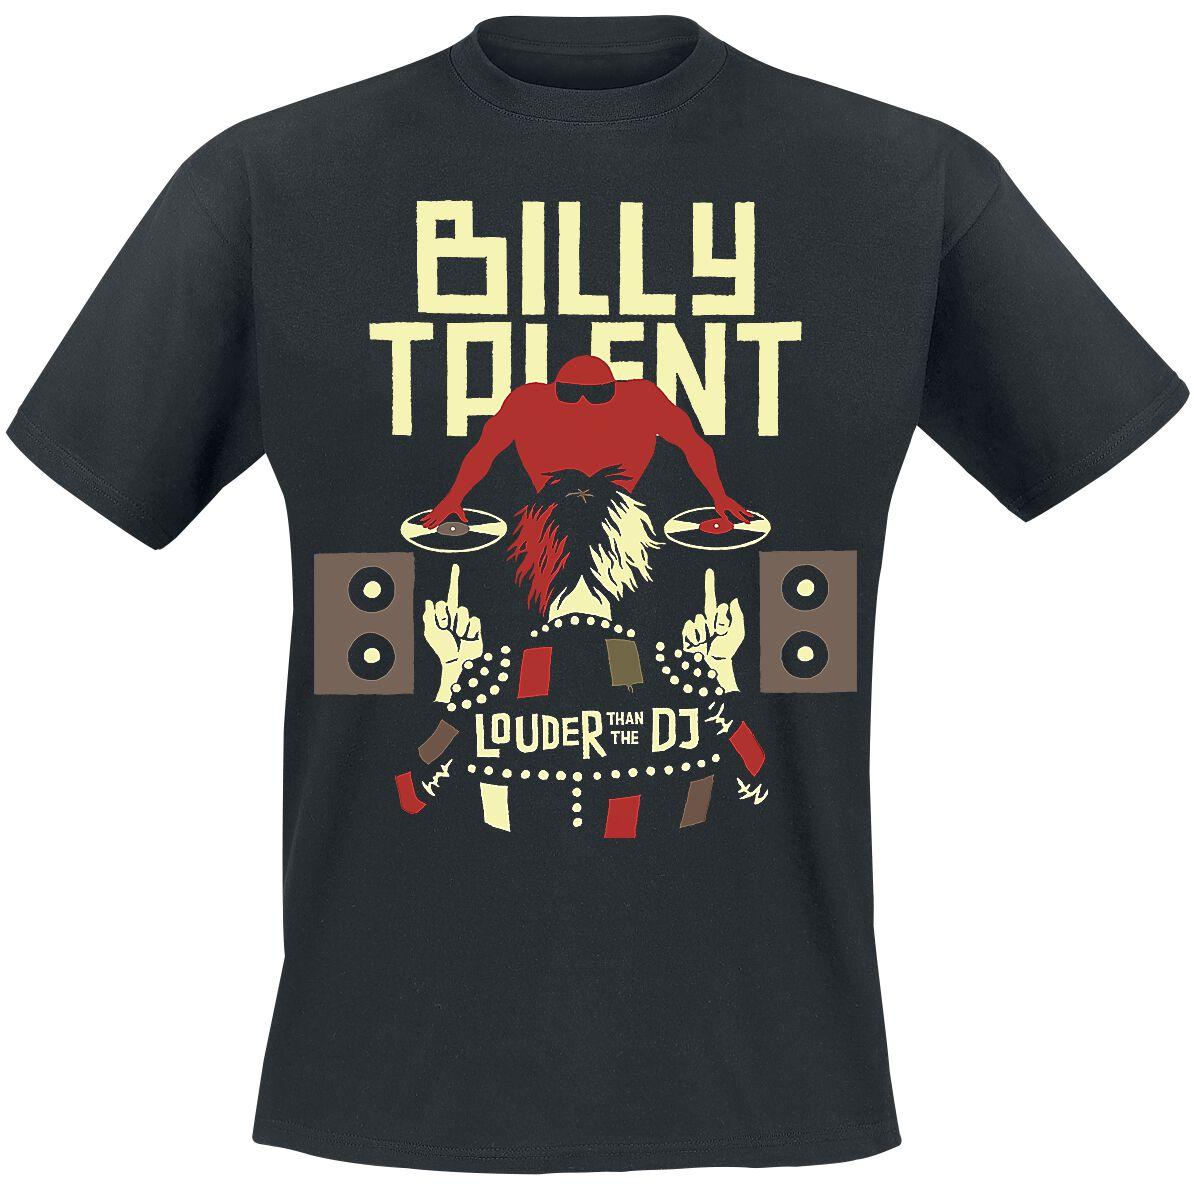 Zespoły - Koszulki - T-Shirt Billy Talent Louder Than The DJ T-Shirt czarny - 337142